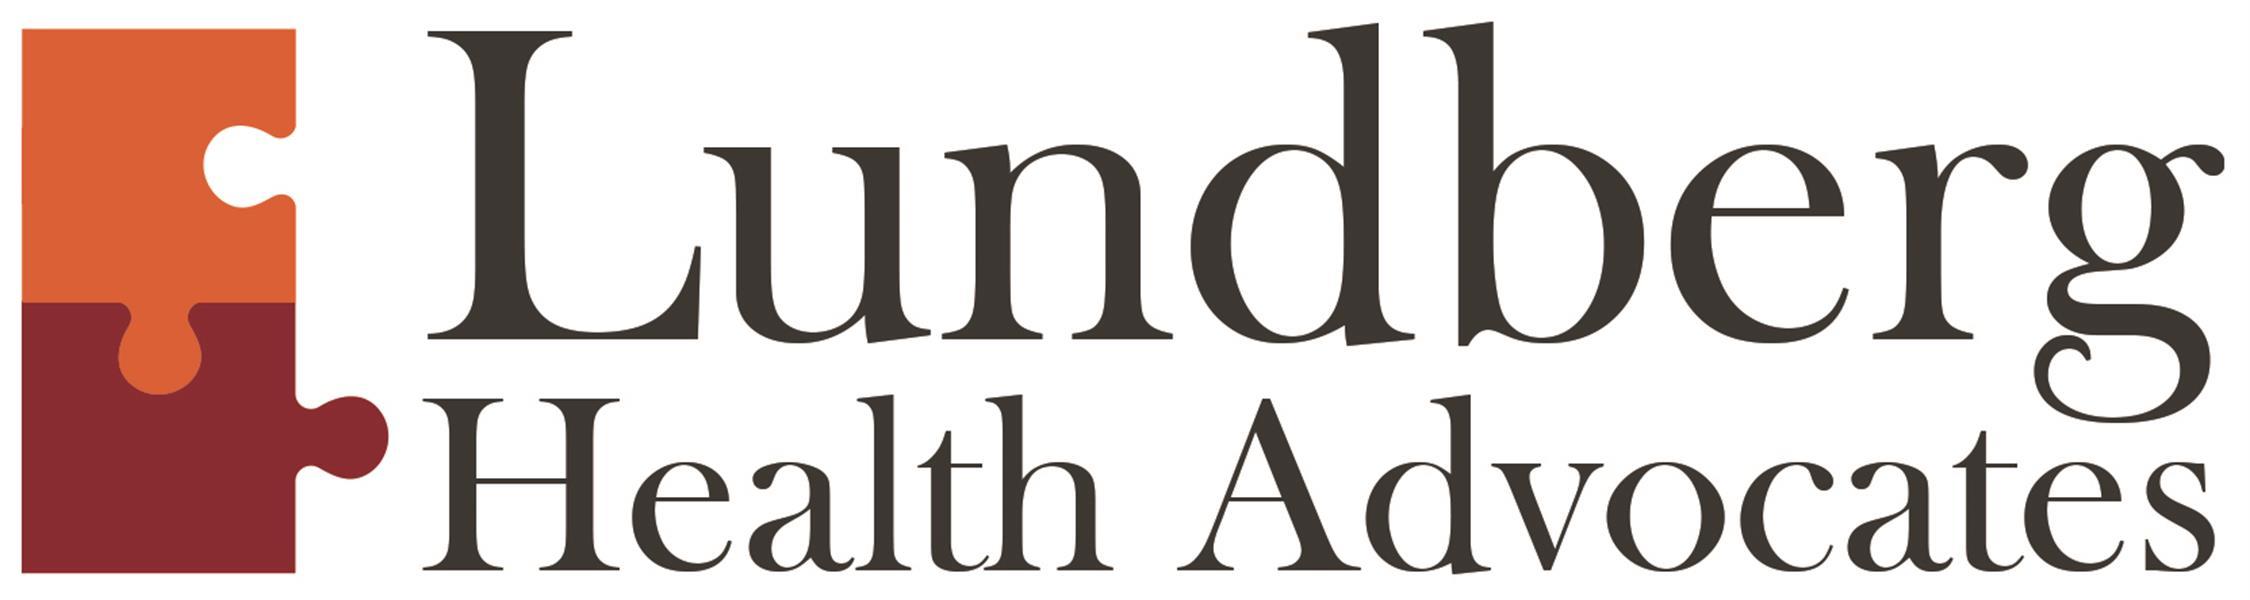 Lundberg Health Advocates